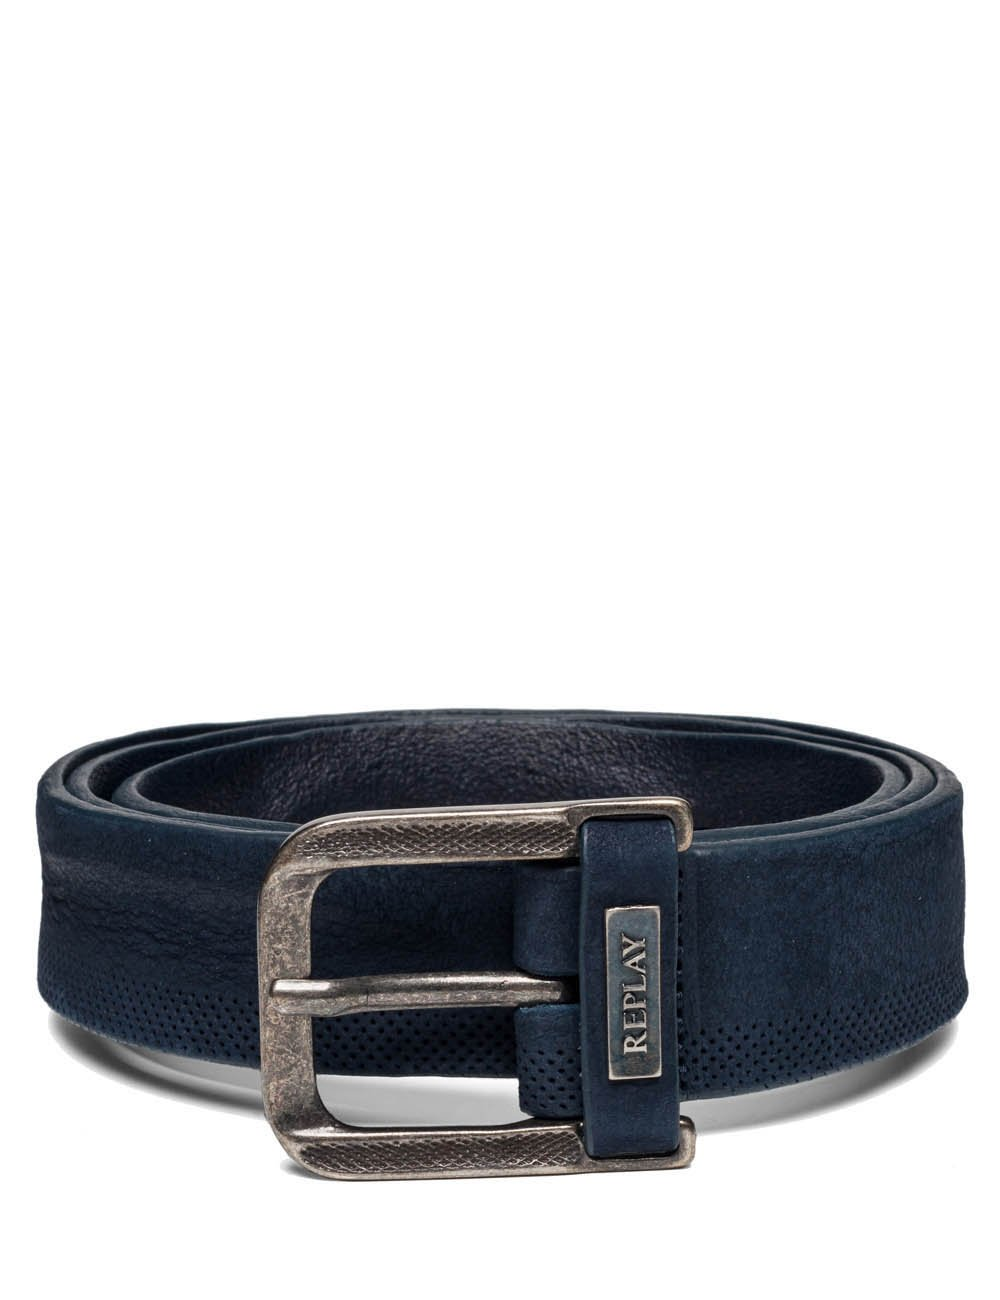 Replay Men's Men's Leather Blue Belt in Size 100 Blue